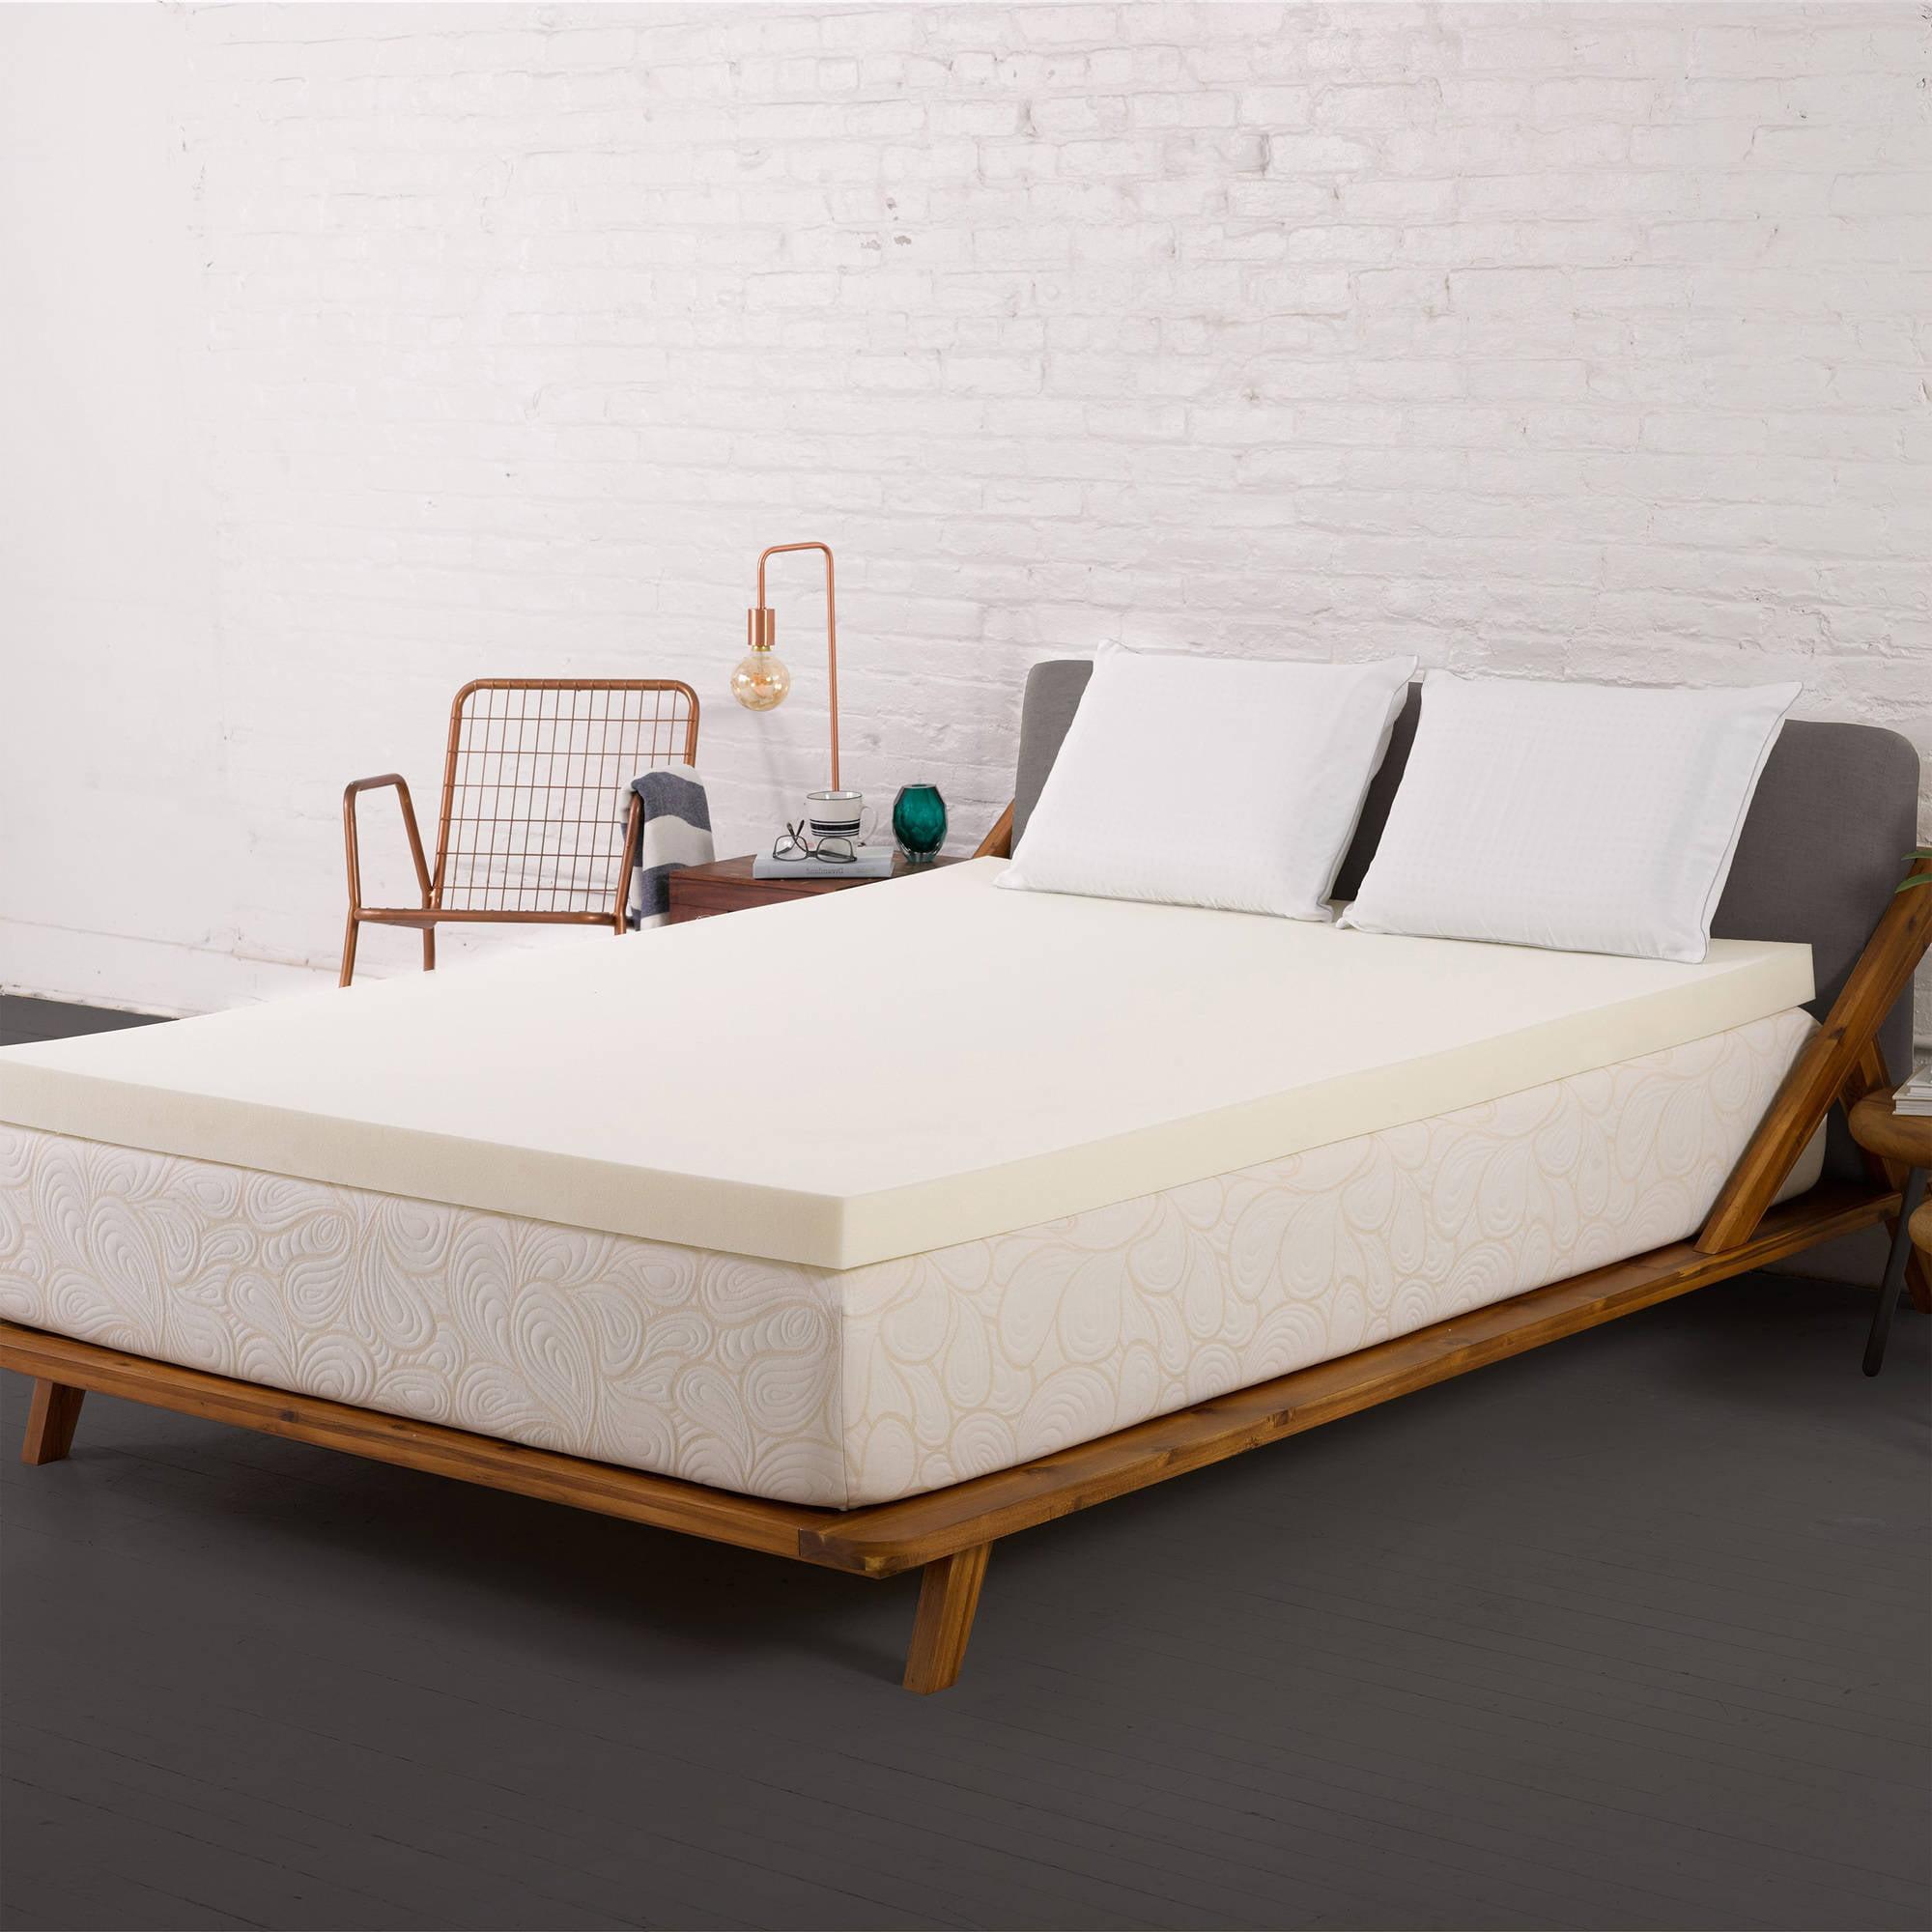 Authentic Comfort 4-Inch Memory Foam Mattress Topper by Sleep Studio, LLC